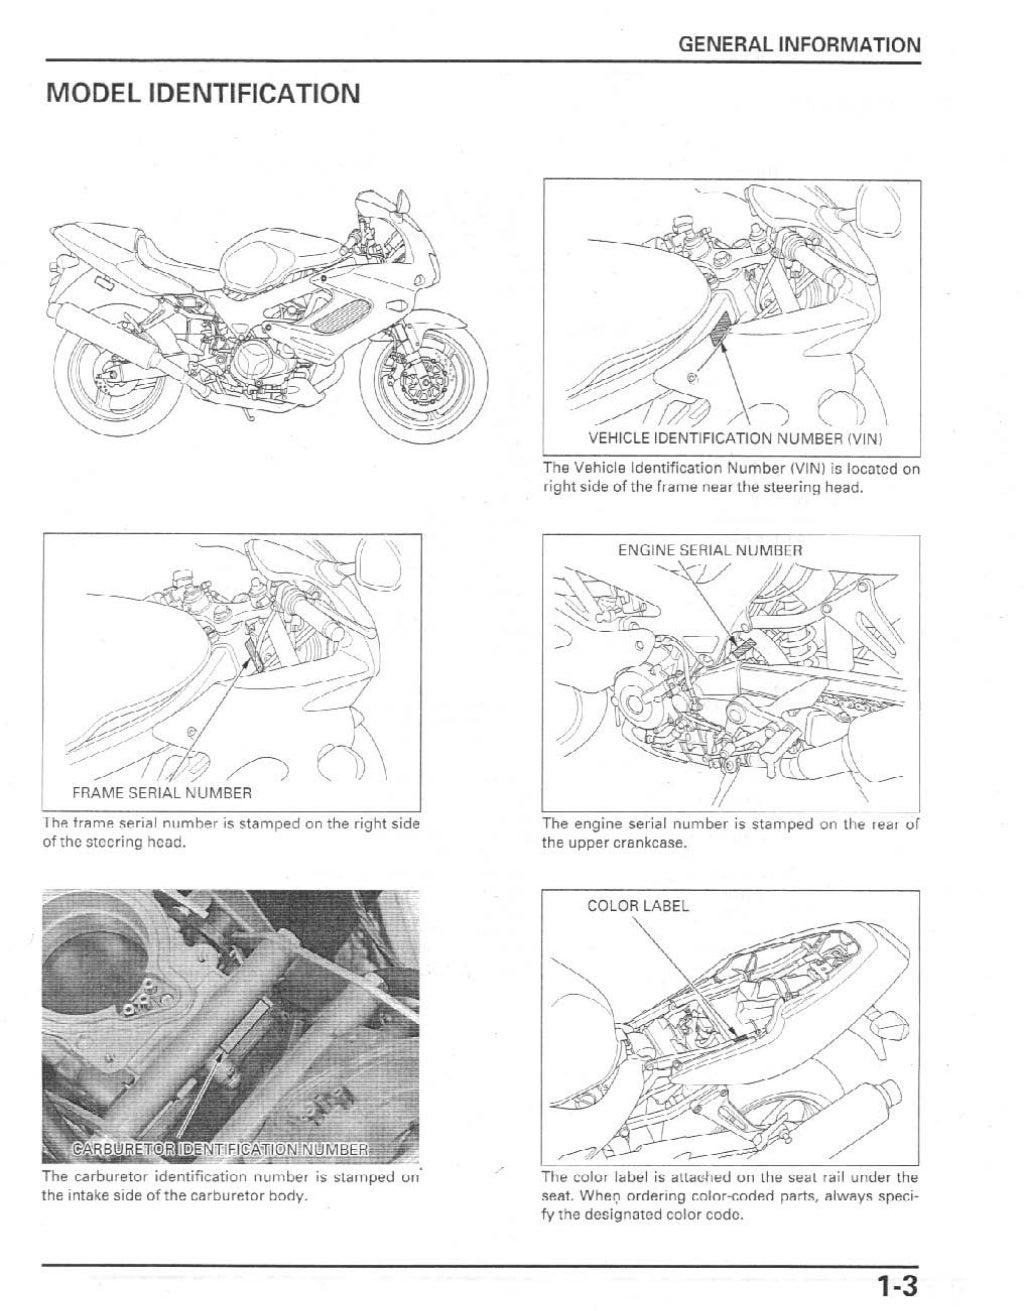 2002 honda vtr1000 f2 superhawk service repair manual